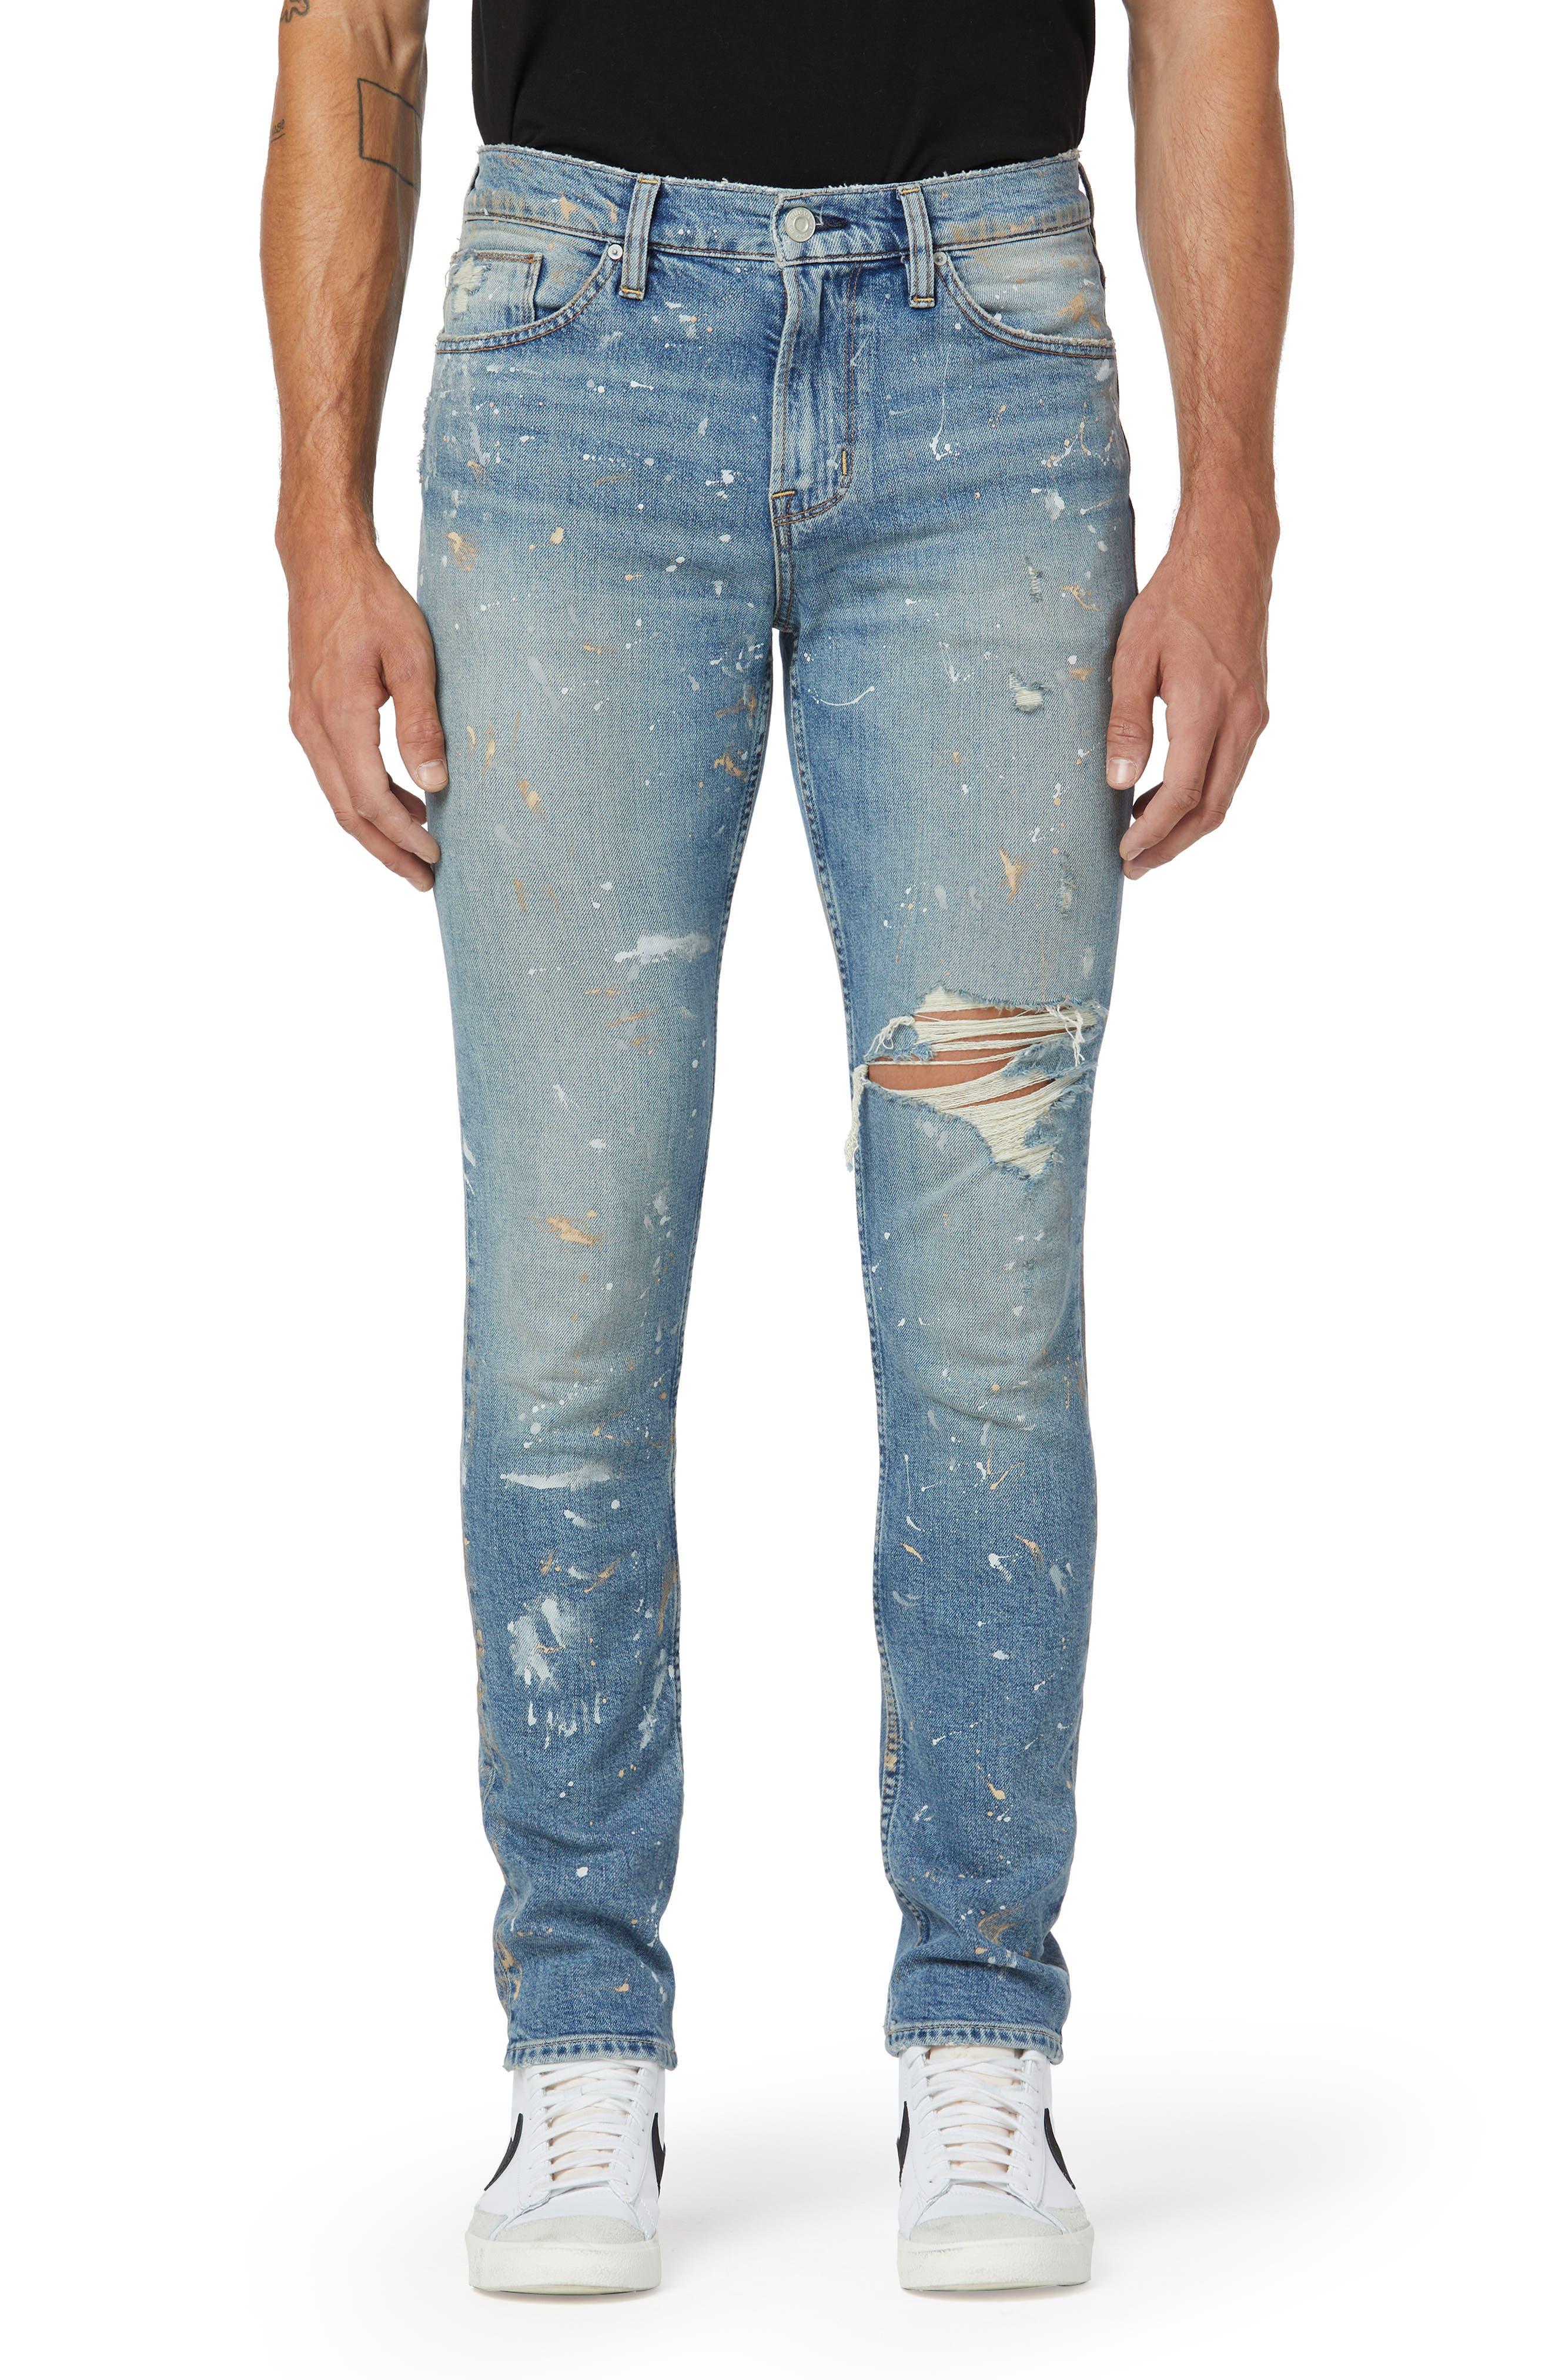 Axl Ripped Skinny Fit Jeans